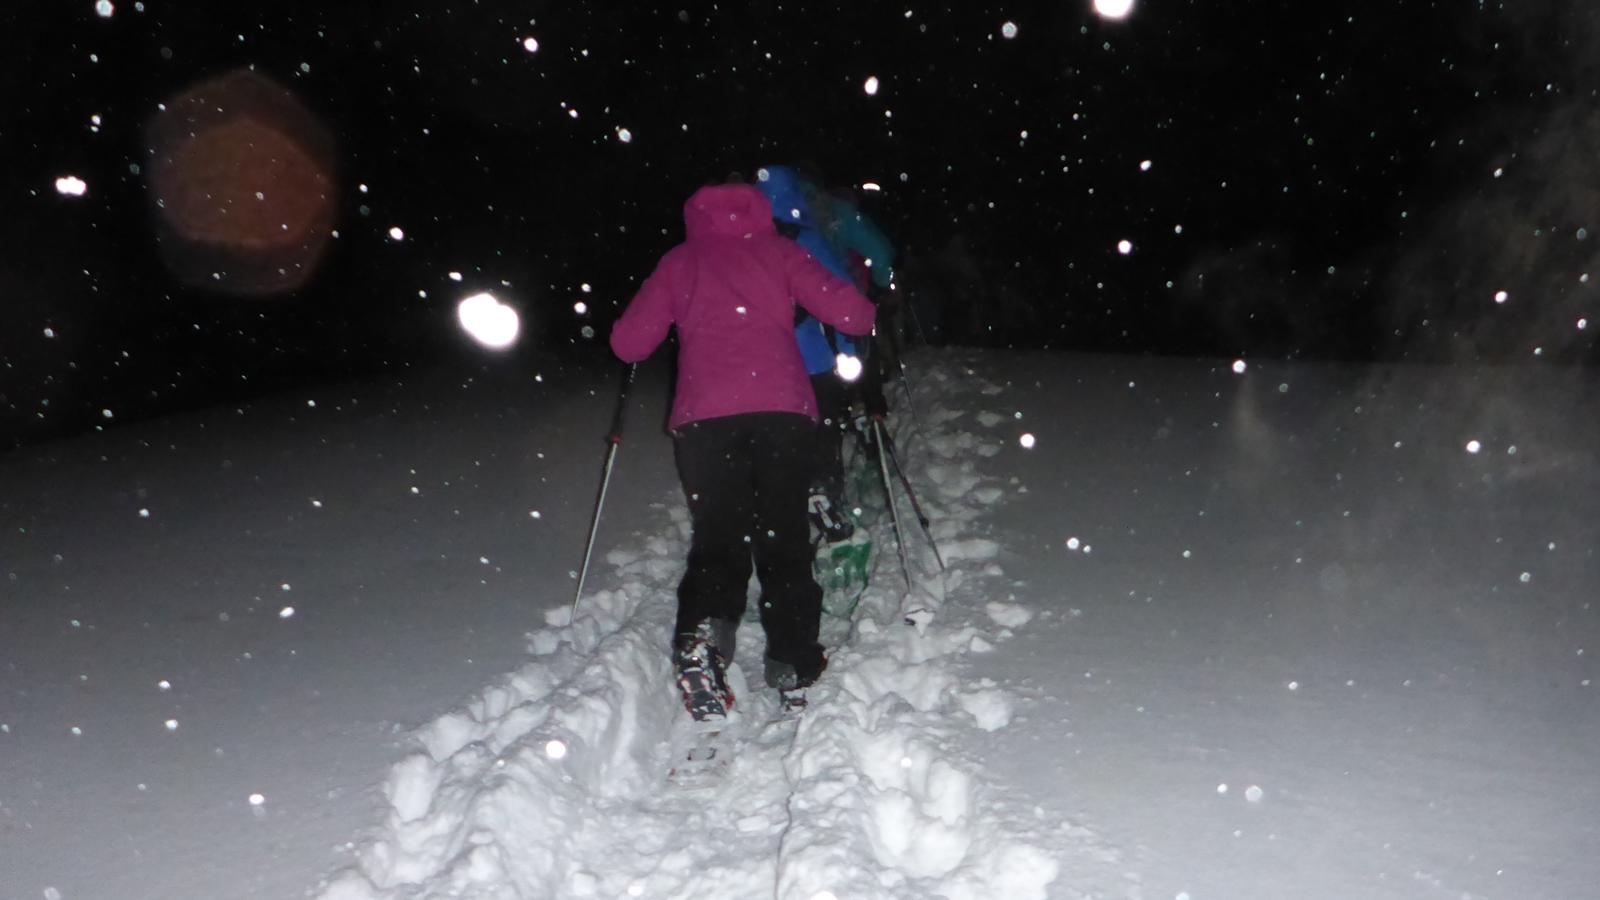 Snowshoe Hiking | Corporate Event | Teambuilding | Snow Adventure